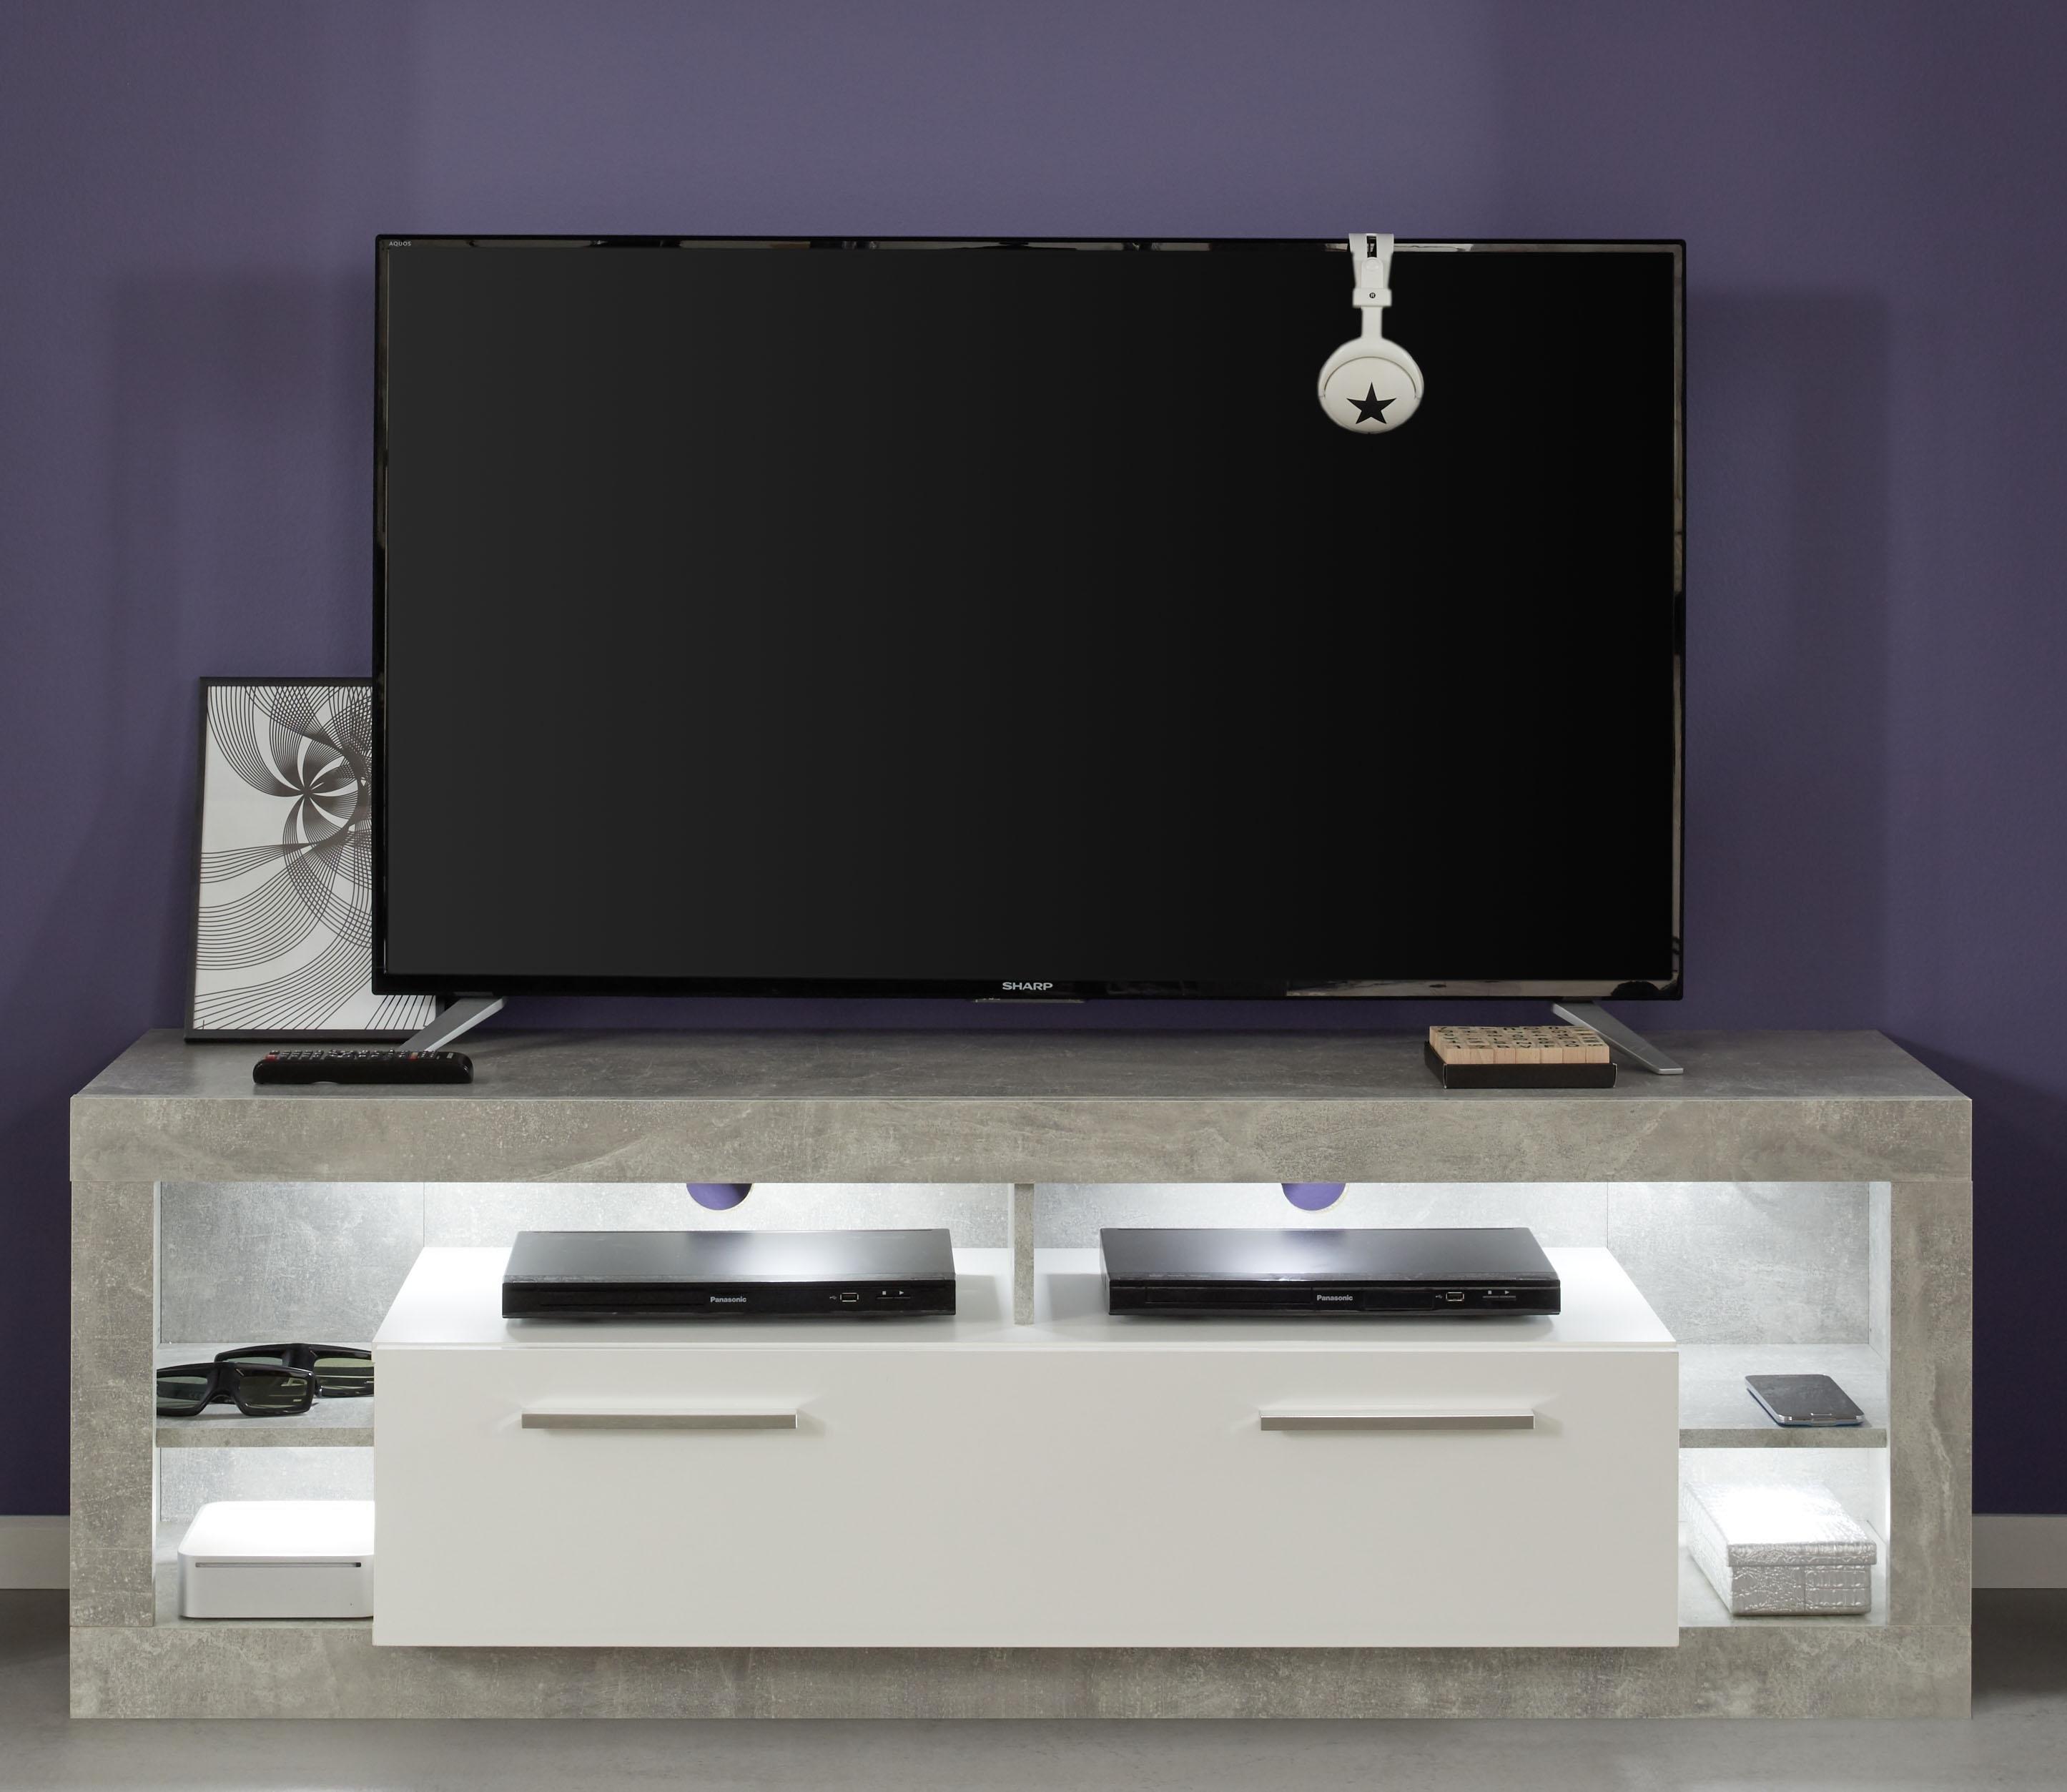 Lowboard Tv Kast.Lowboard Online Kopen Bekijk Onze Lowboards Online Otto